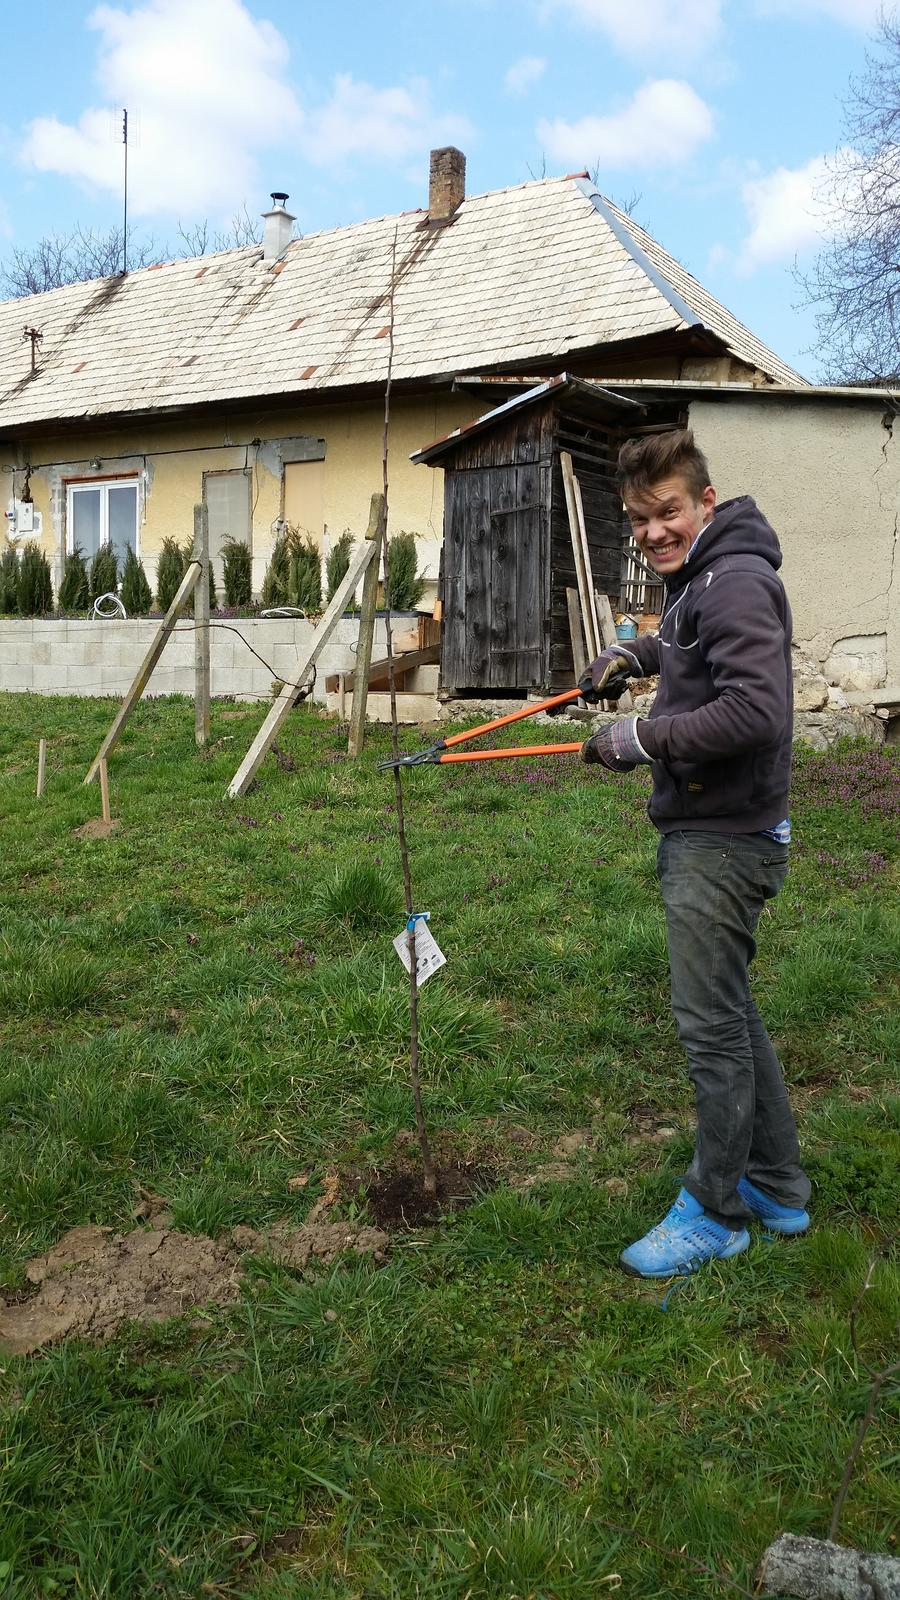 HACIENDA NAPOLI SEBECHLEBY - postav dom,zasad strom :)